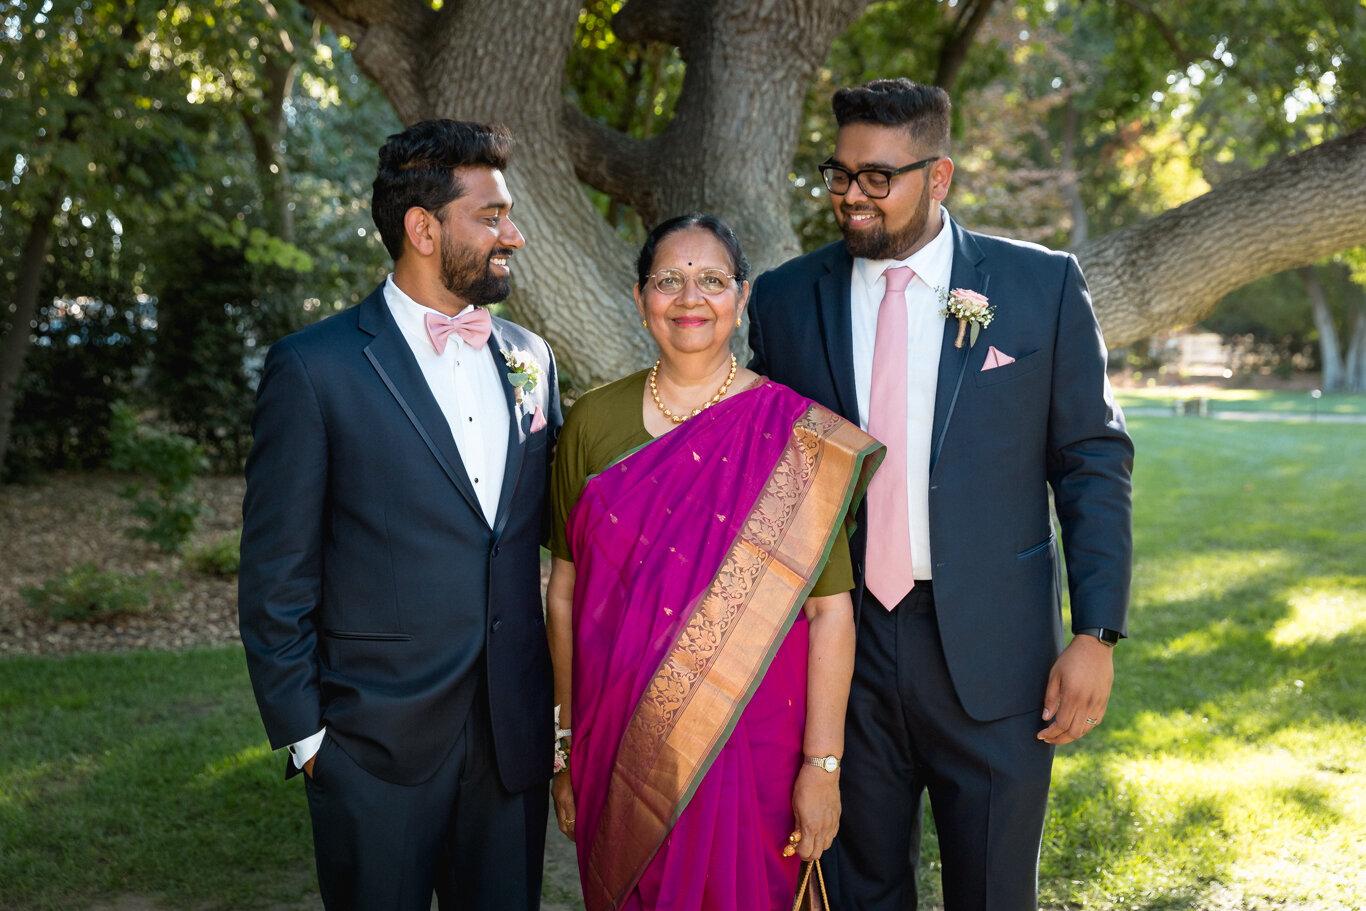 2019.08.24_Emily-Ashir-Wedding-at-the-Maples-5953.jpg